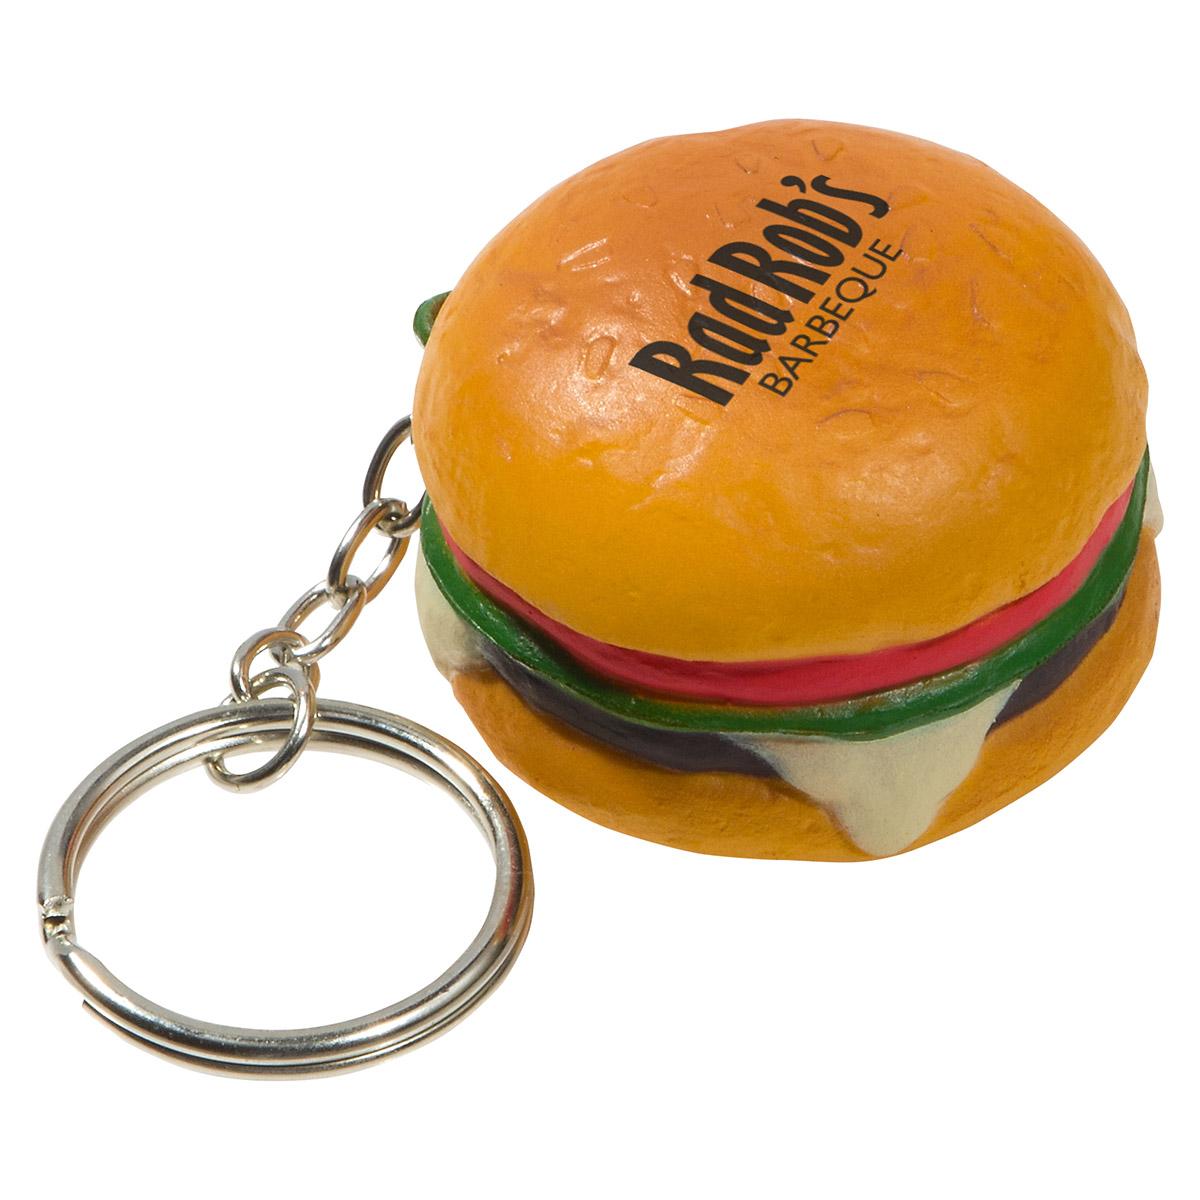 Hamburger Stress Reliever Keychain, LKC-HB07 - 1 Colour Imprint